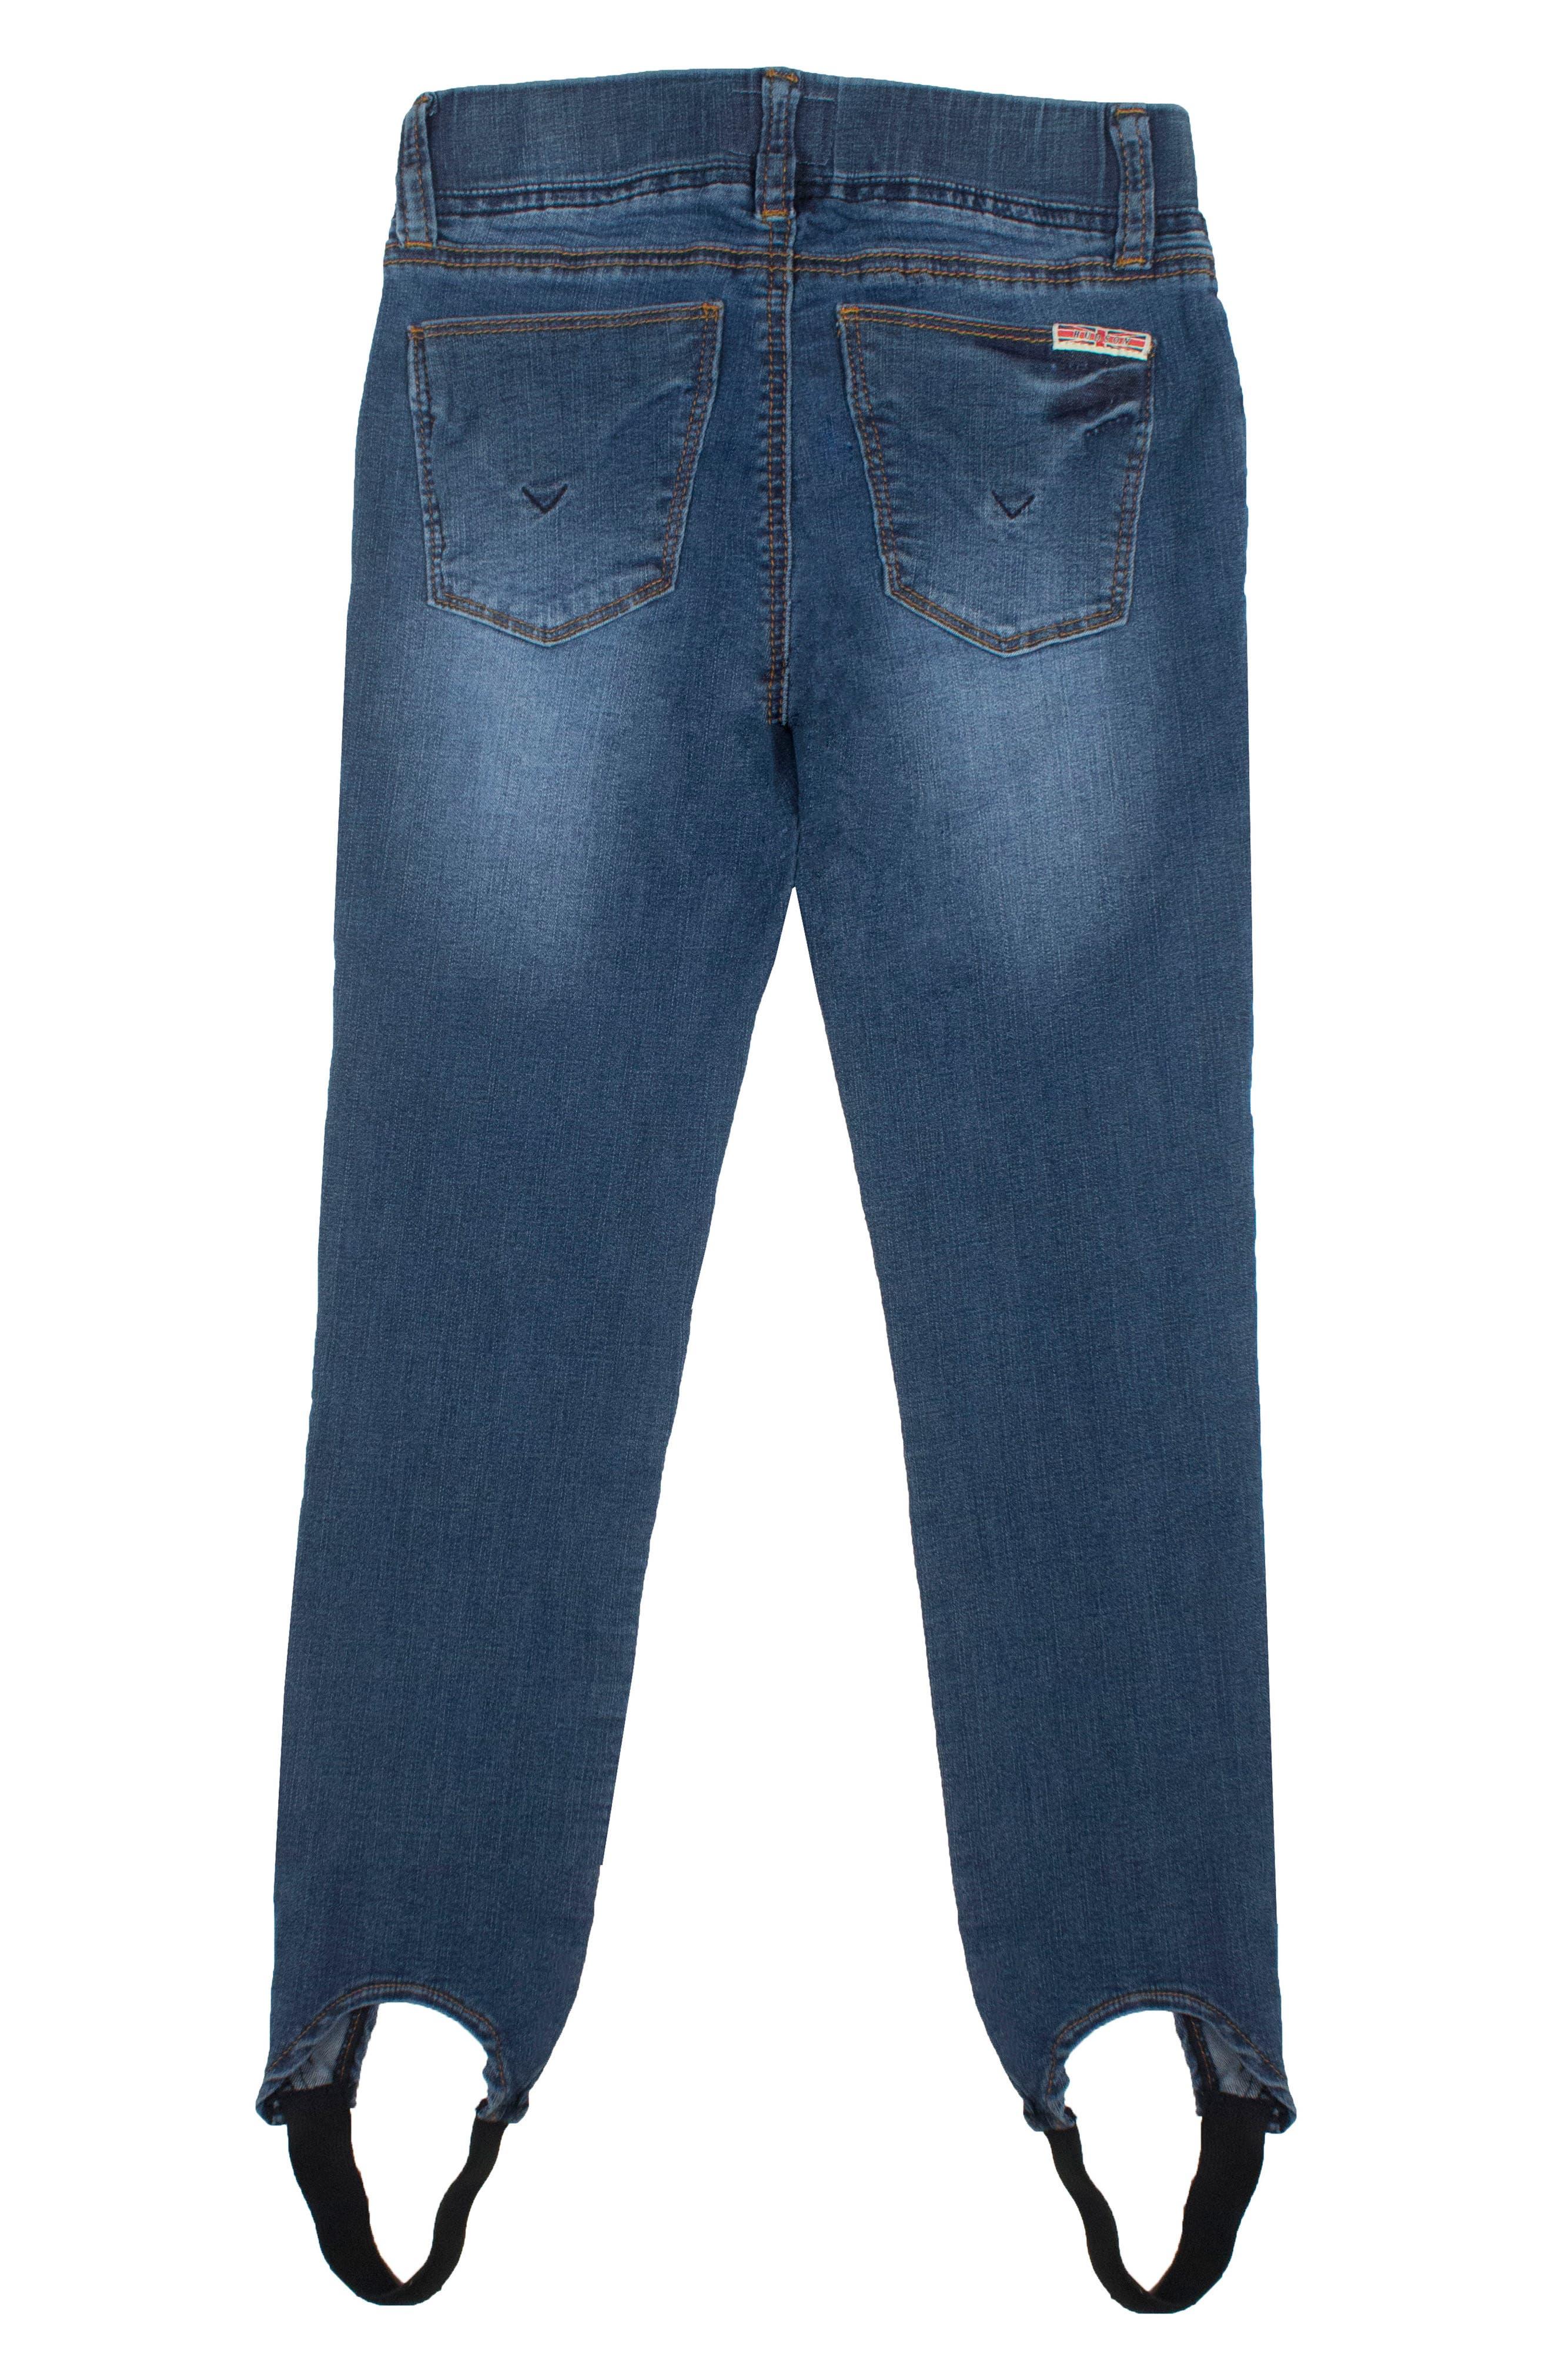 Rosa Stirrup Jeans,                             Alternate thumbnail 2, color,                             Naval Blue